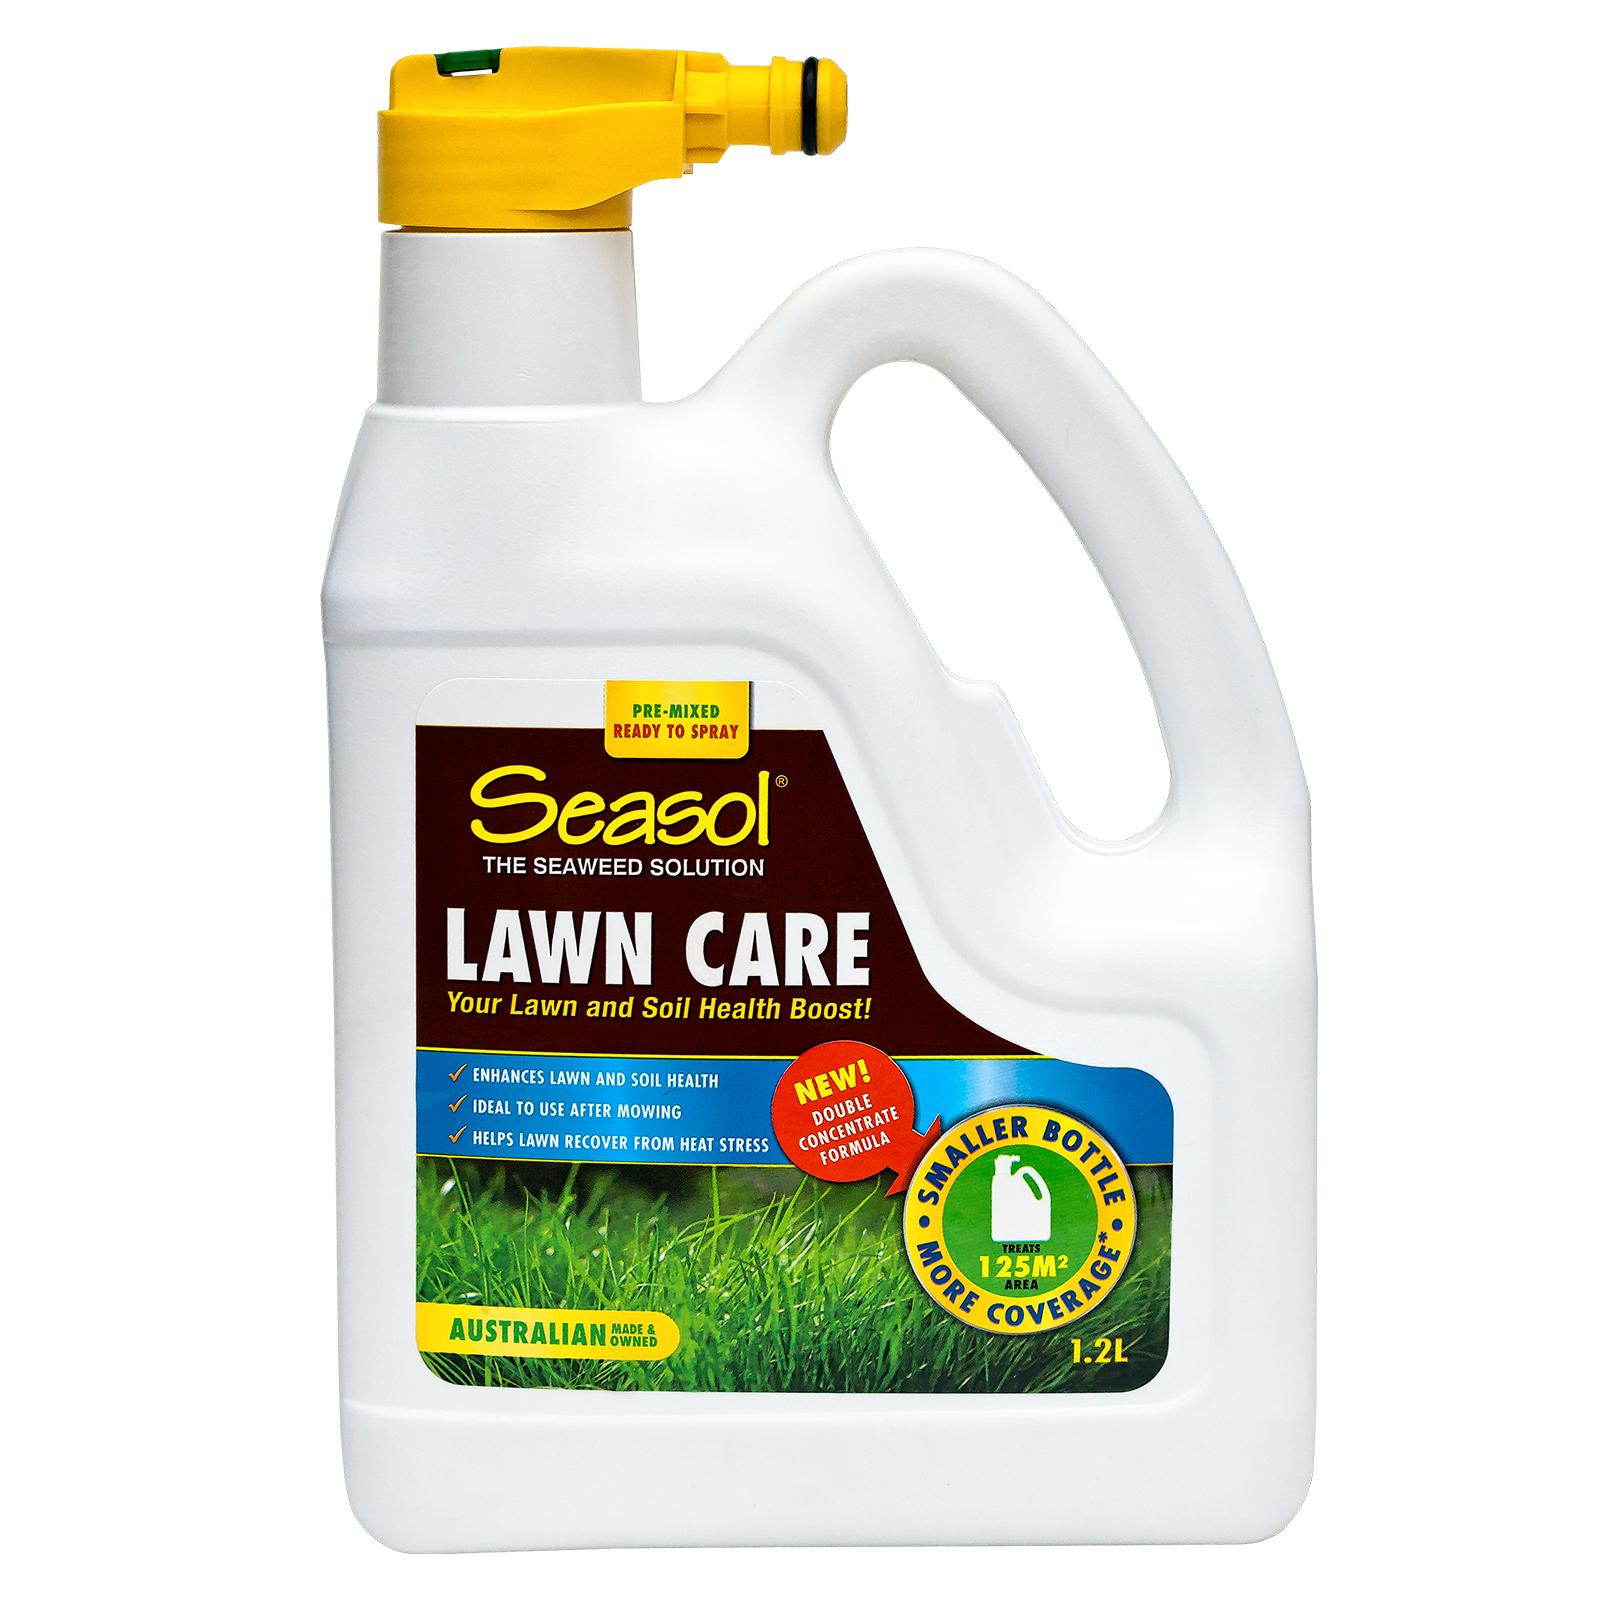 Seasol 1.2L Hose On Lawn Care